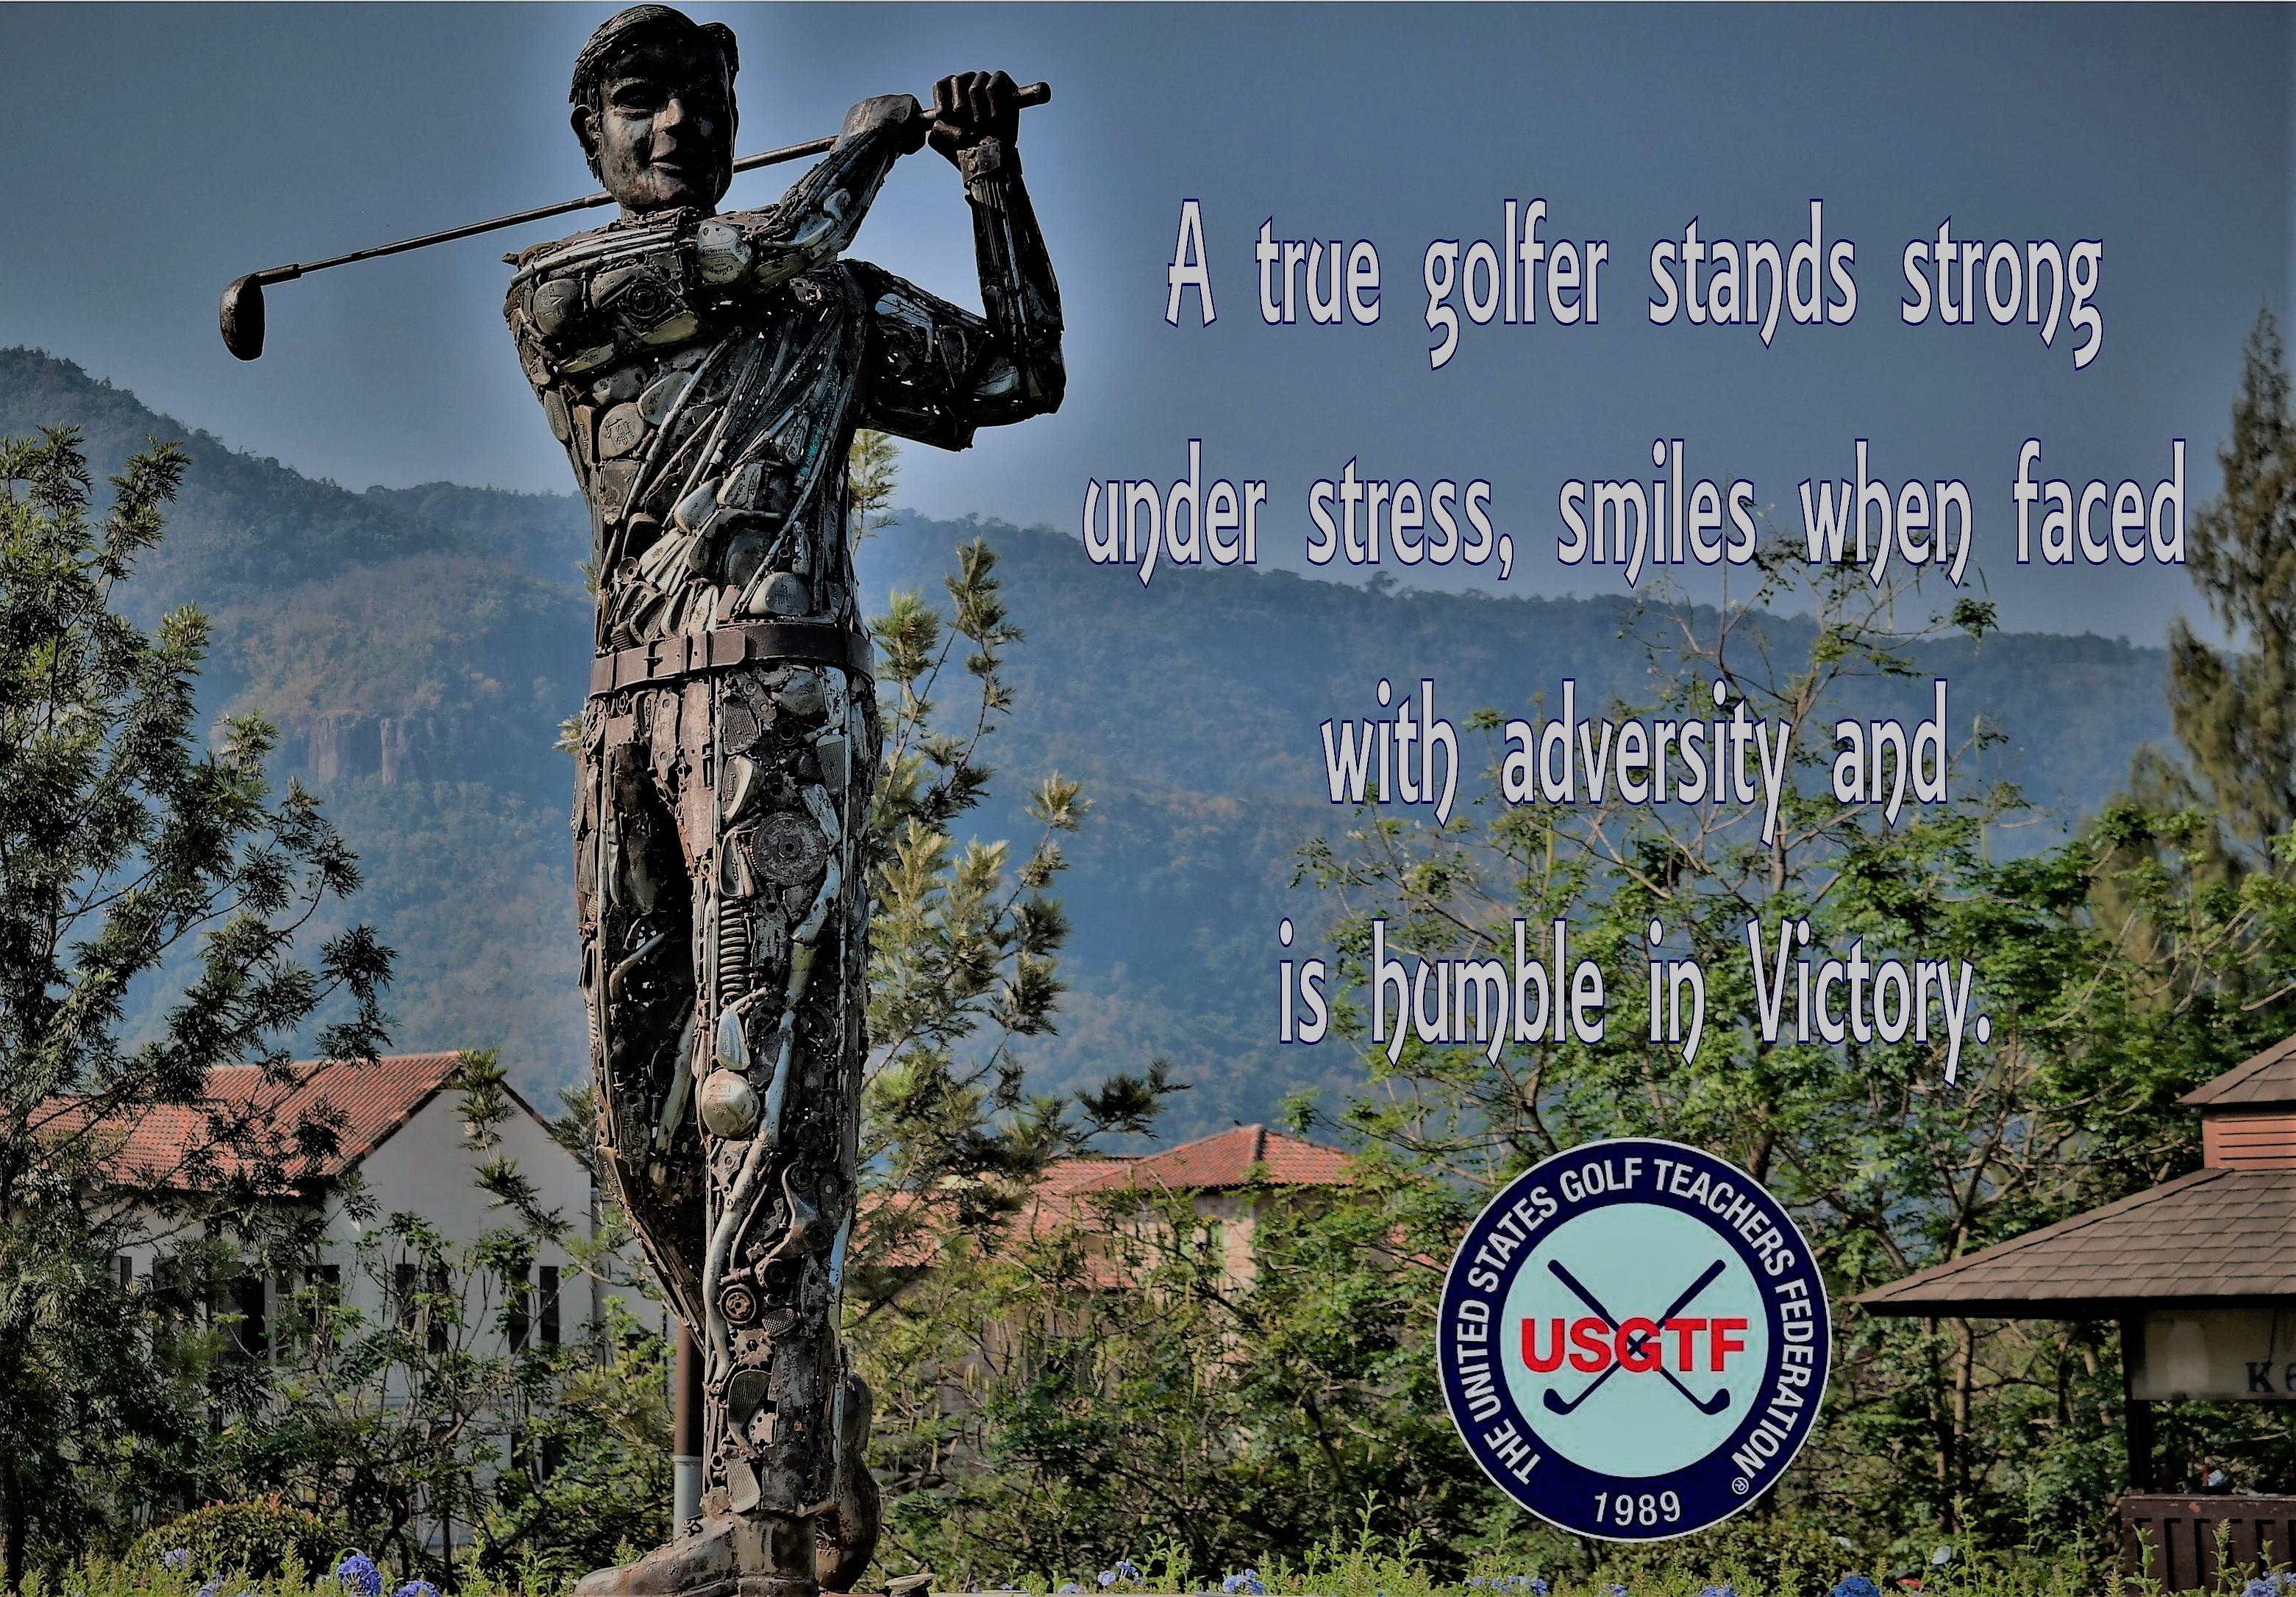 United States Golf Teachers Federation image 4